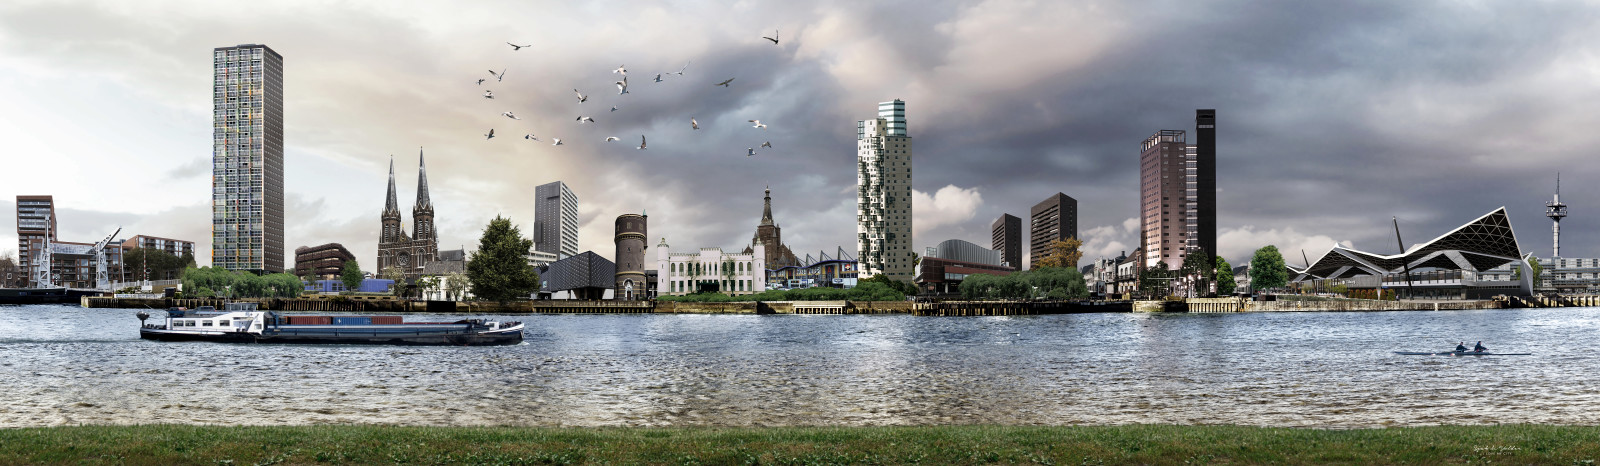 Skyline gebouwen Tilburg